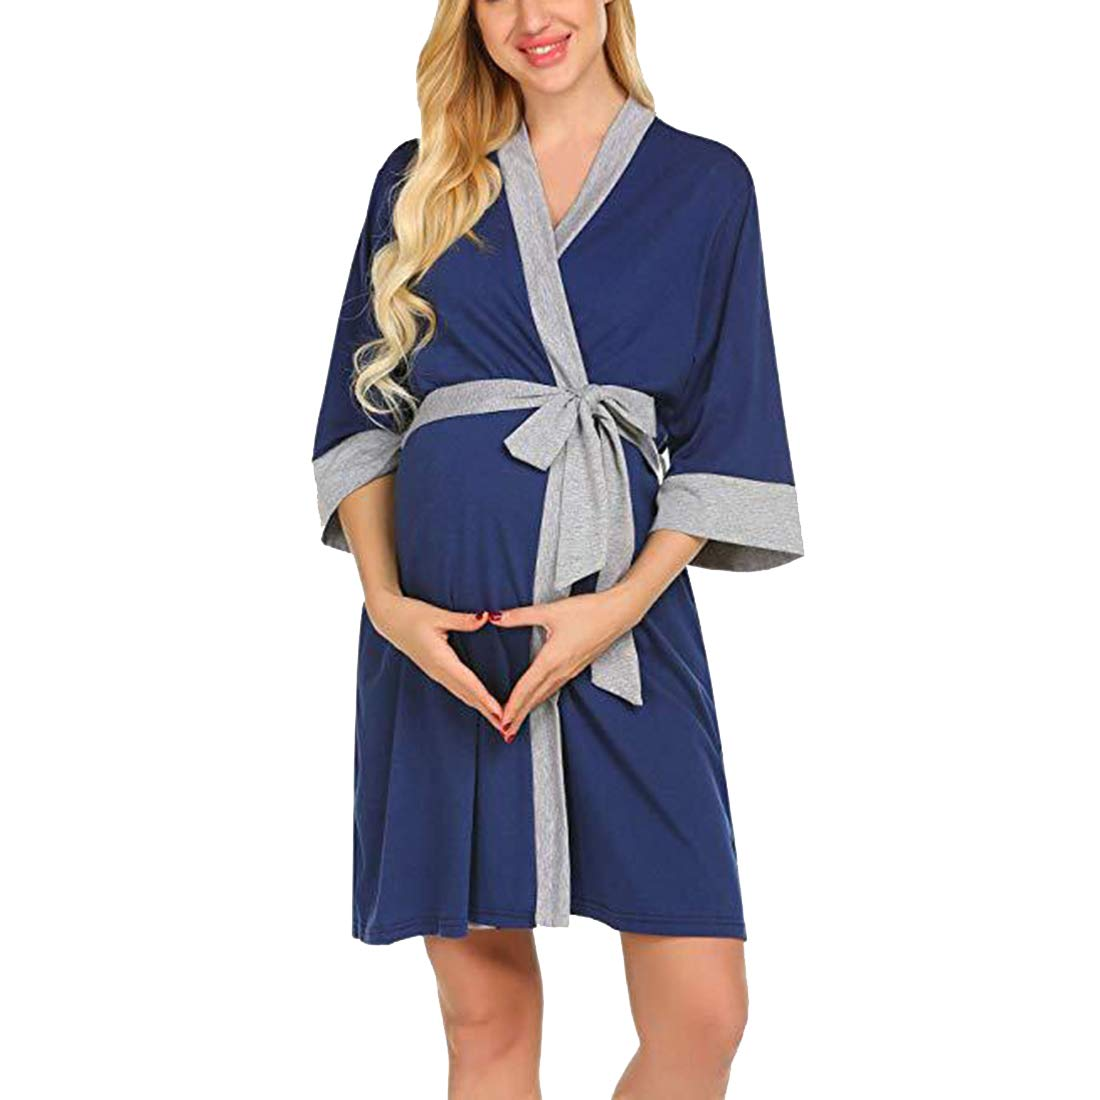 Gagacity Maternity and Nursing Nightwear Hospital Nightdress Breastfeeding Nightie V-Neck